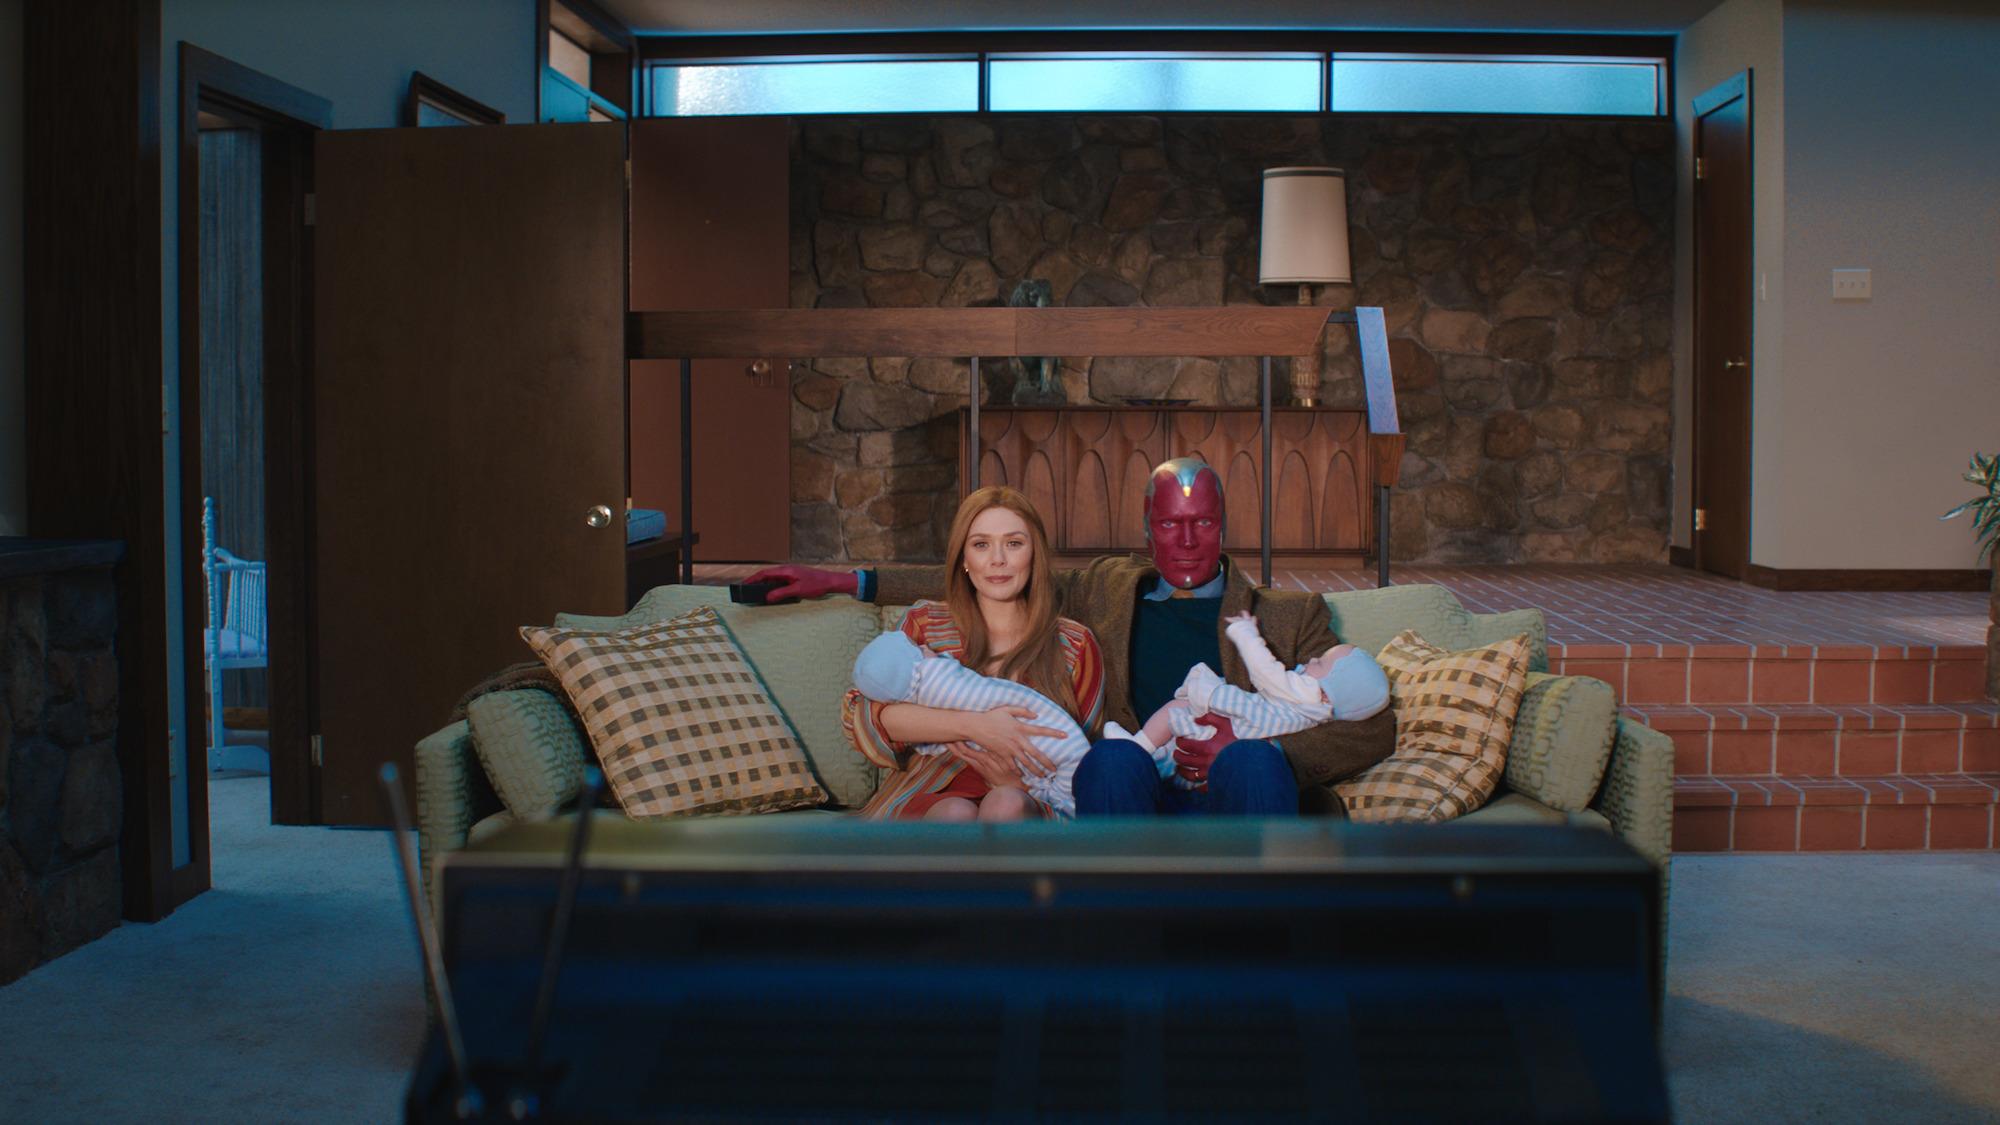 Elizabeth Olsen as Wanda Maximoff and Paul Bettany as Vision in 'WandaVision'